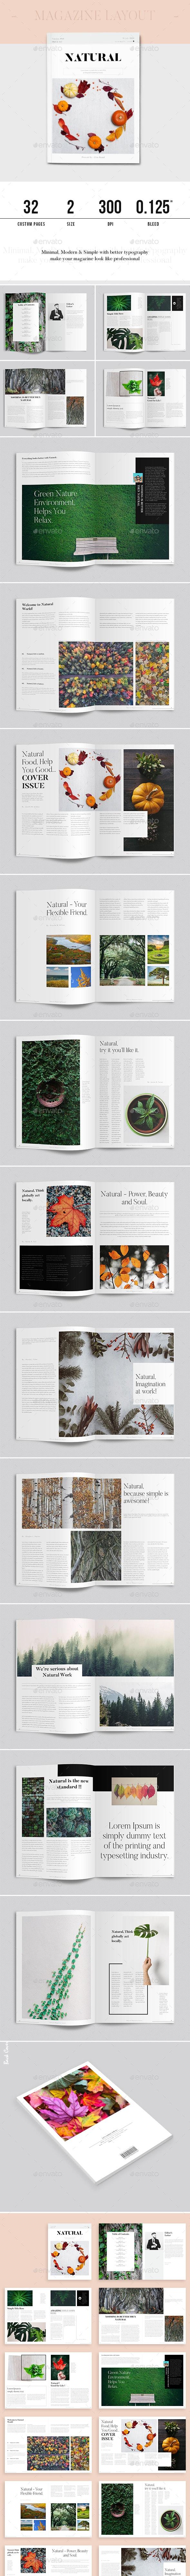 Natural Magazine Layout - Magazines Print Templates